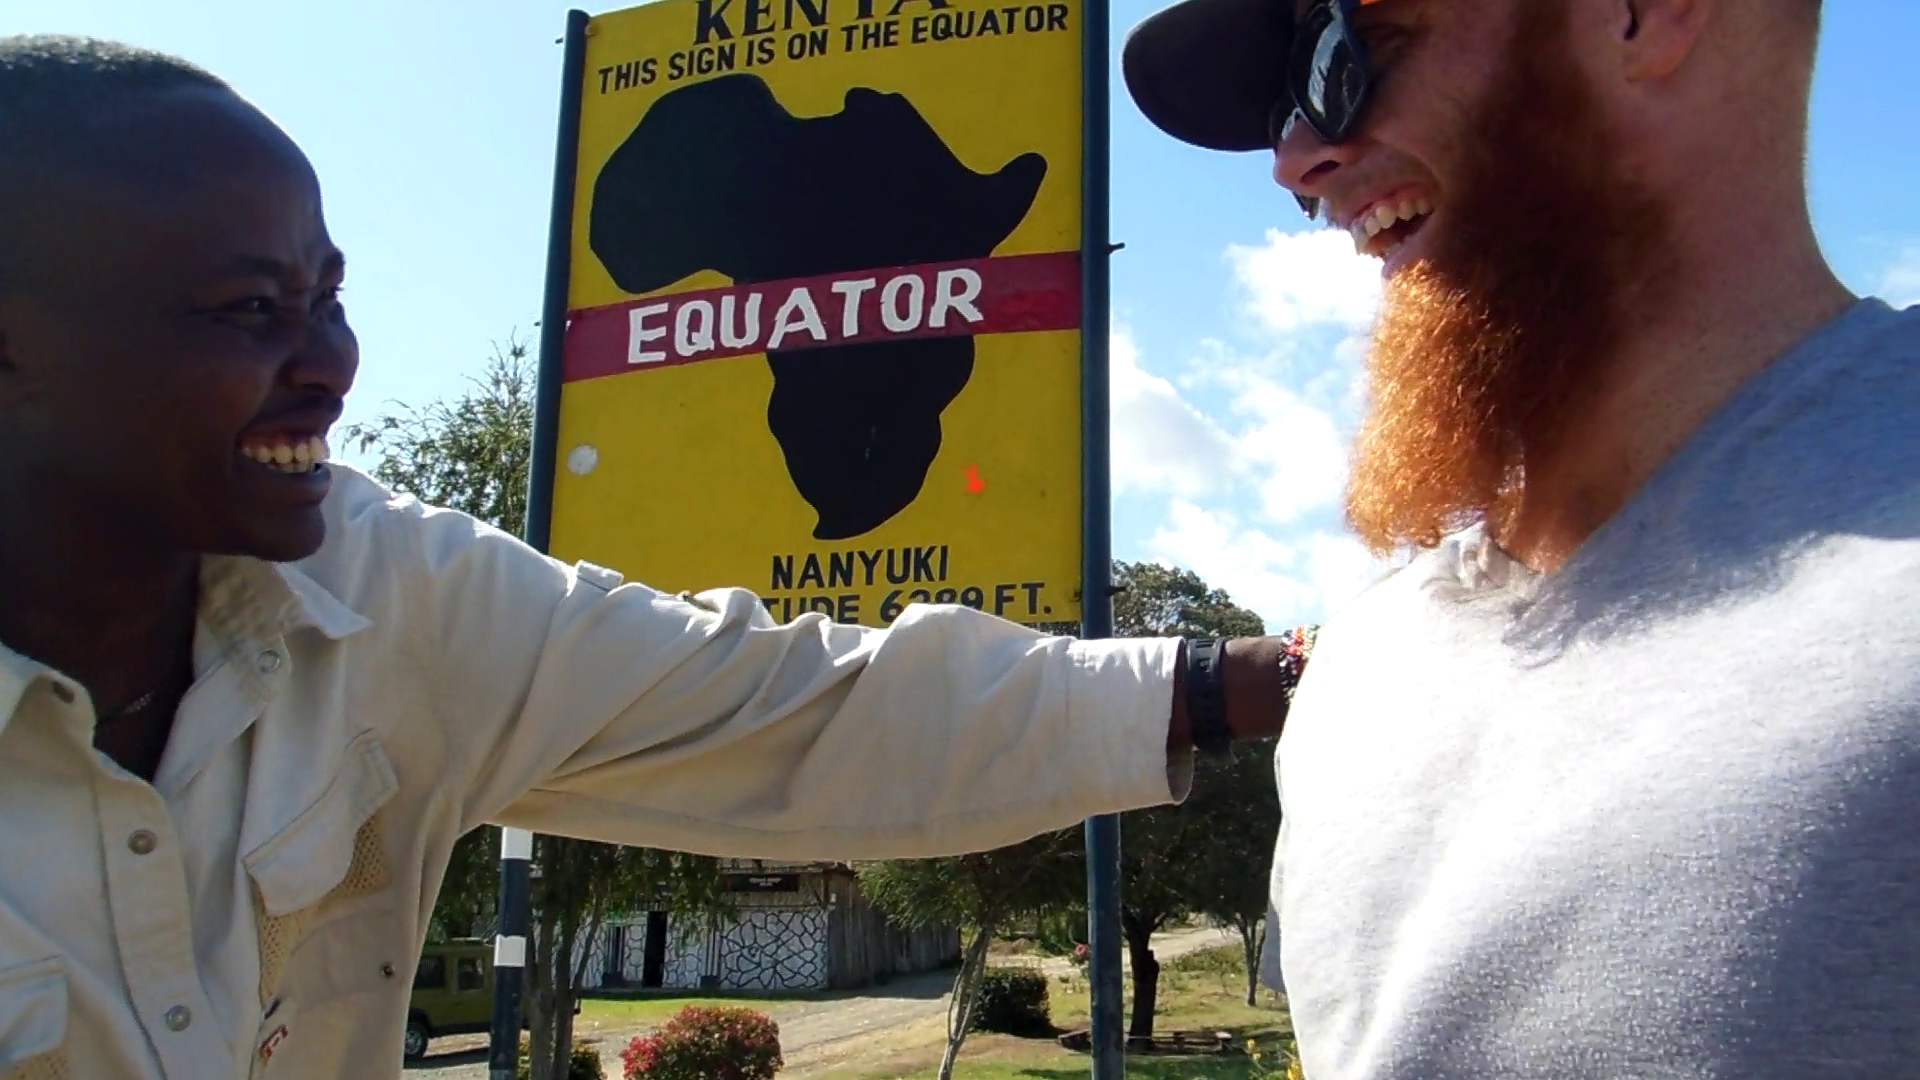 kenya border